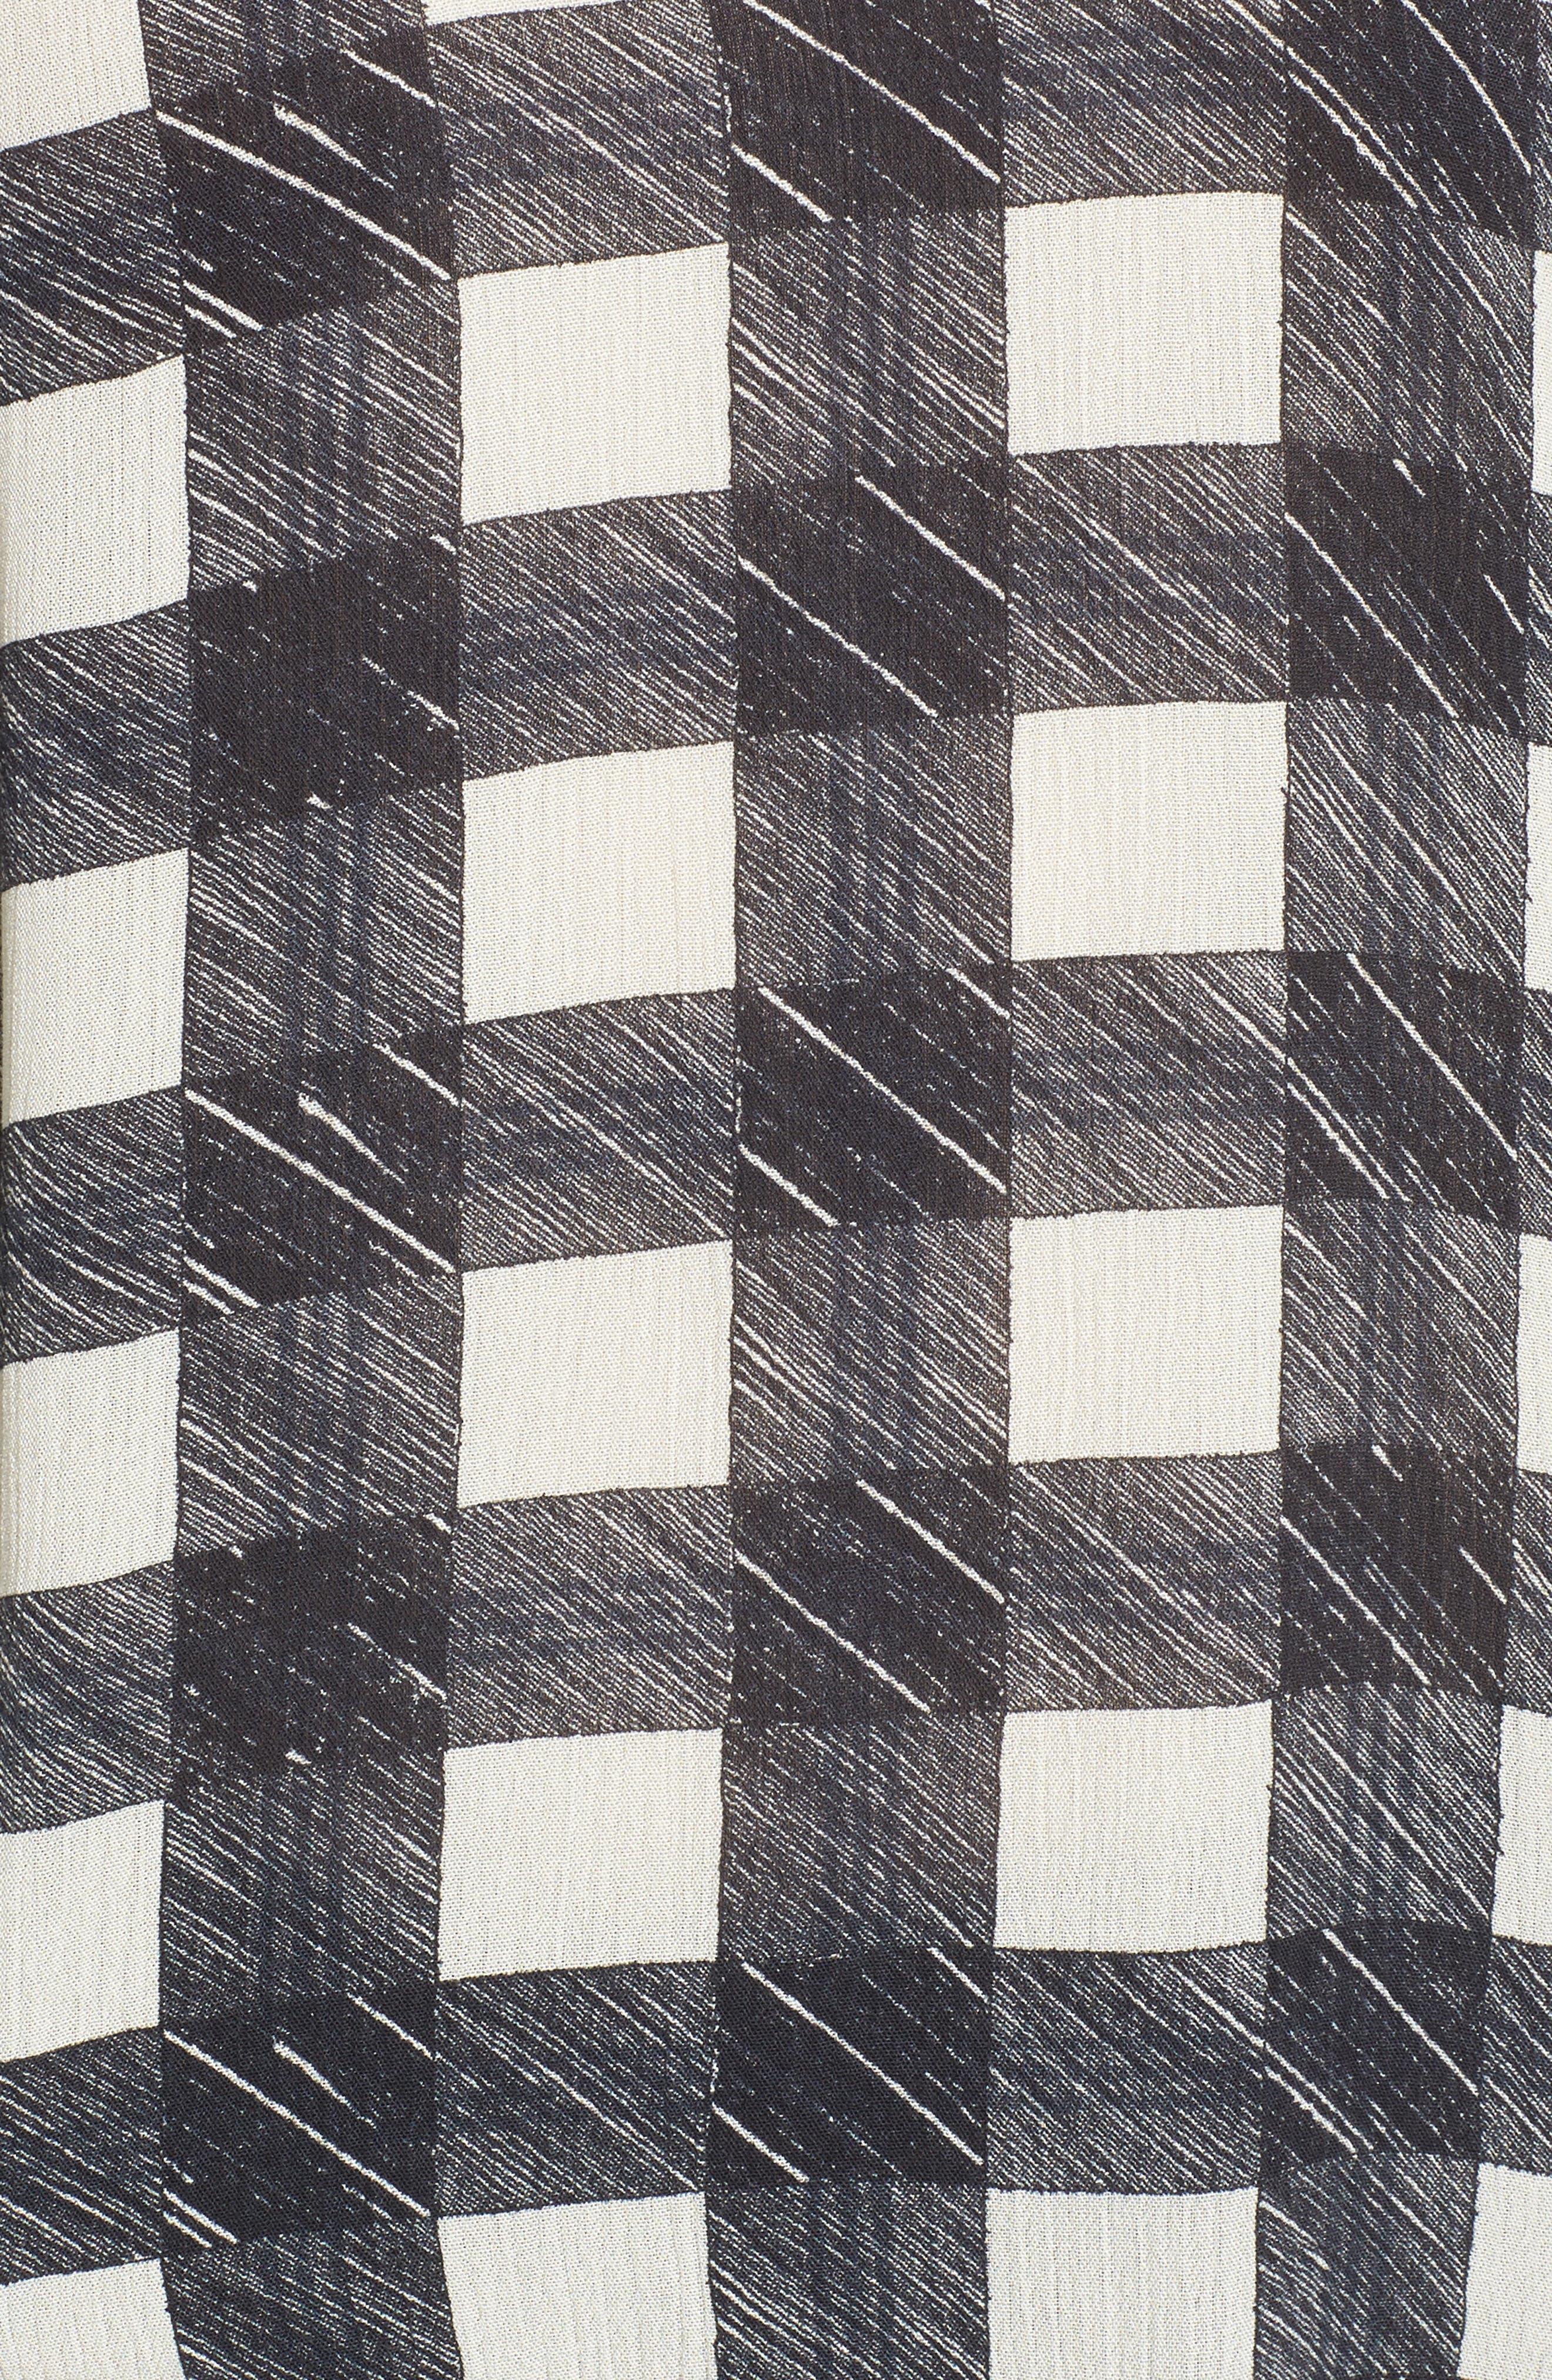 Bijou Ruffle Blouse,                             Alternate thumbnail 5, color,                             True Black/ Moon Glade